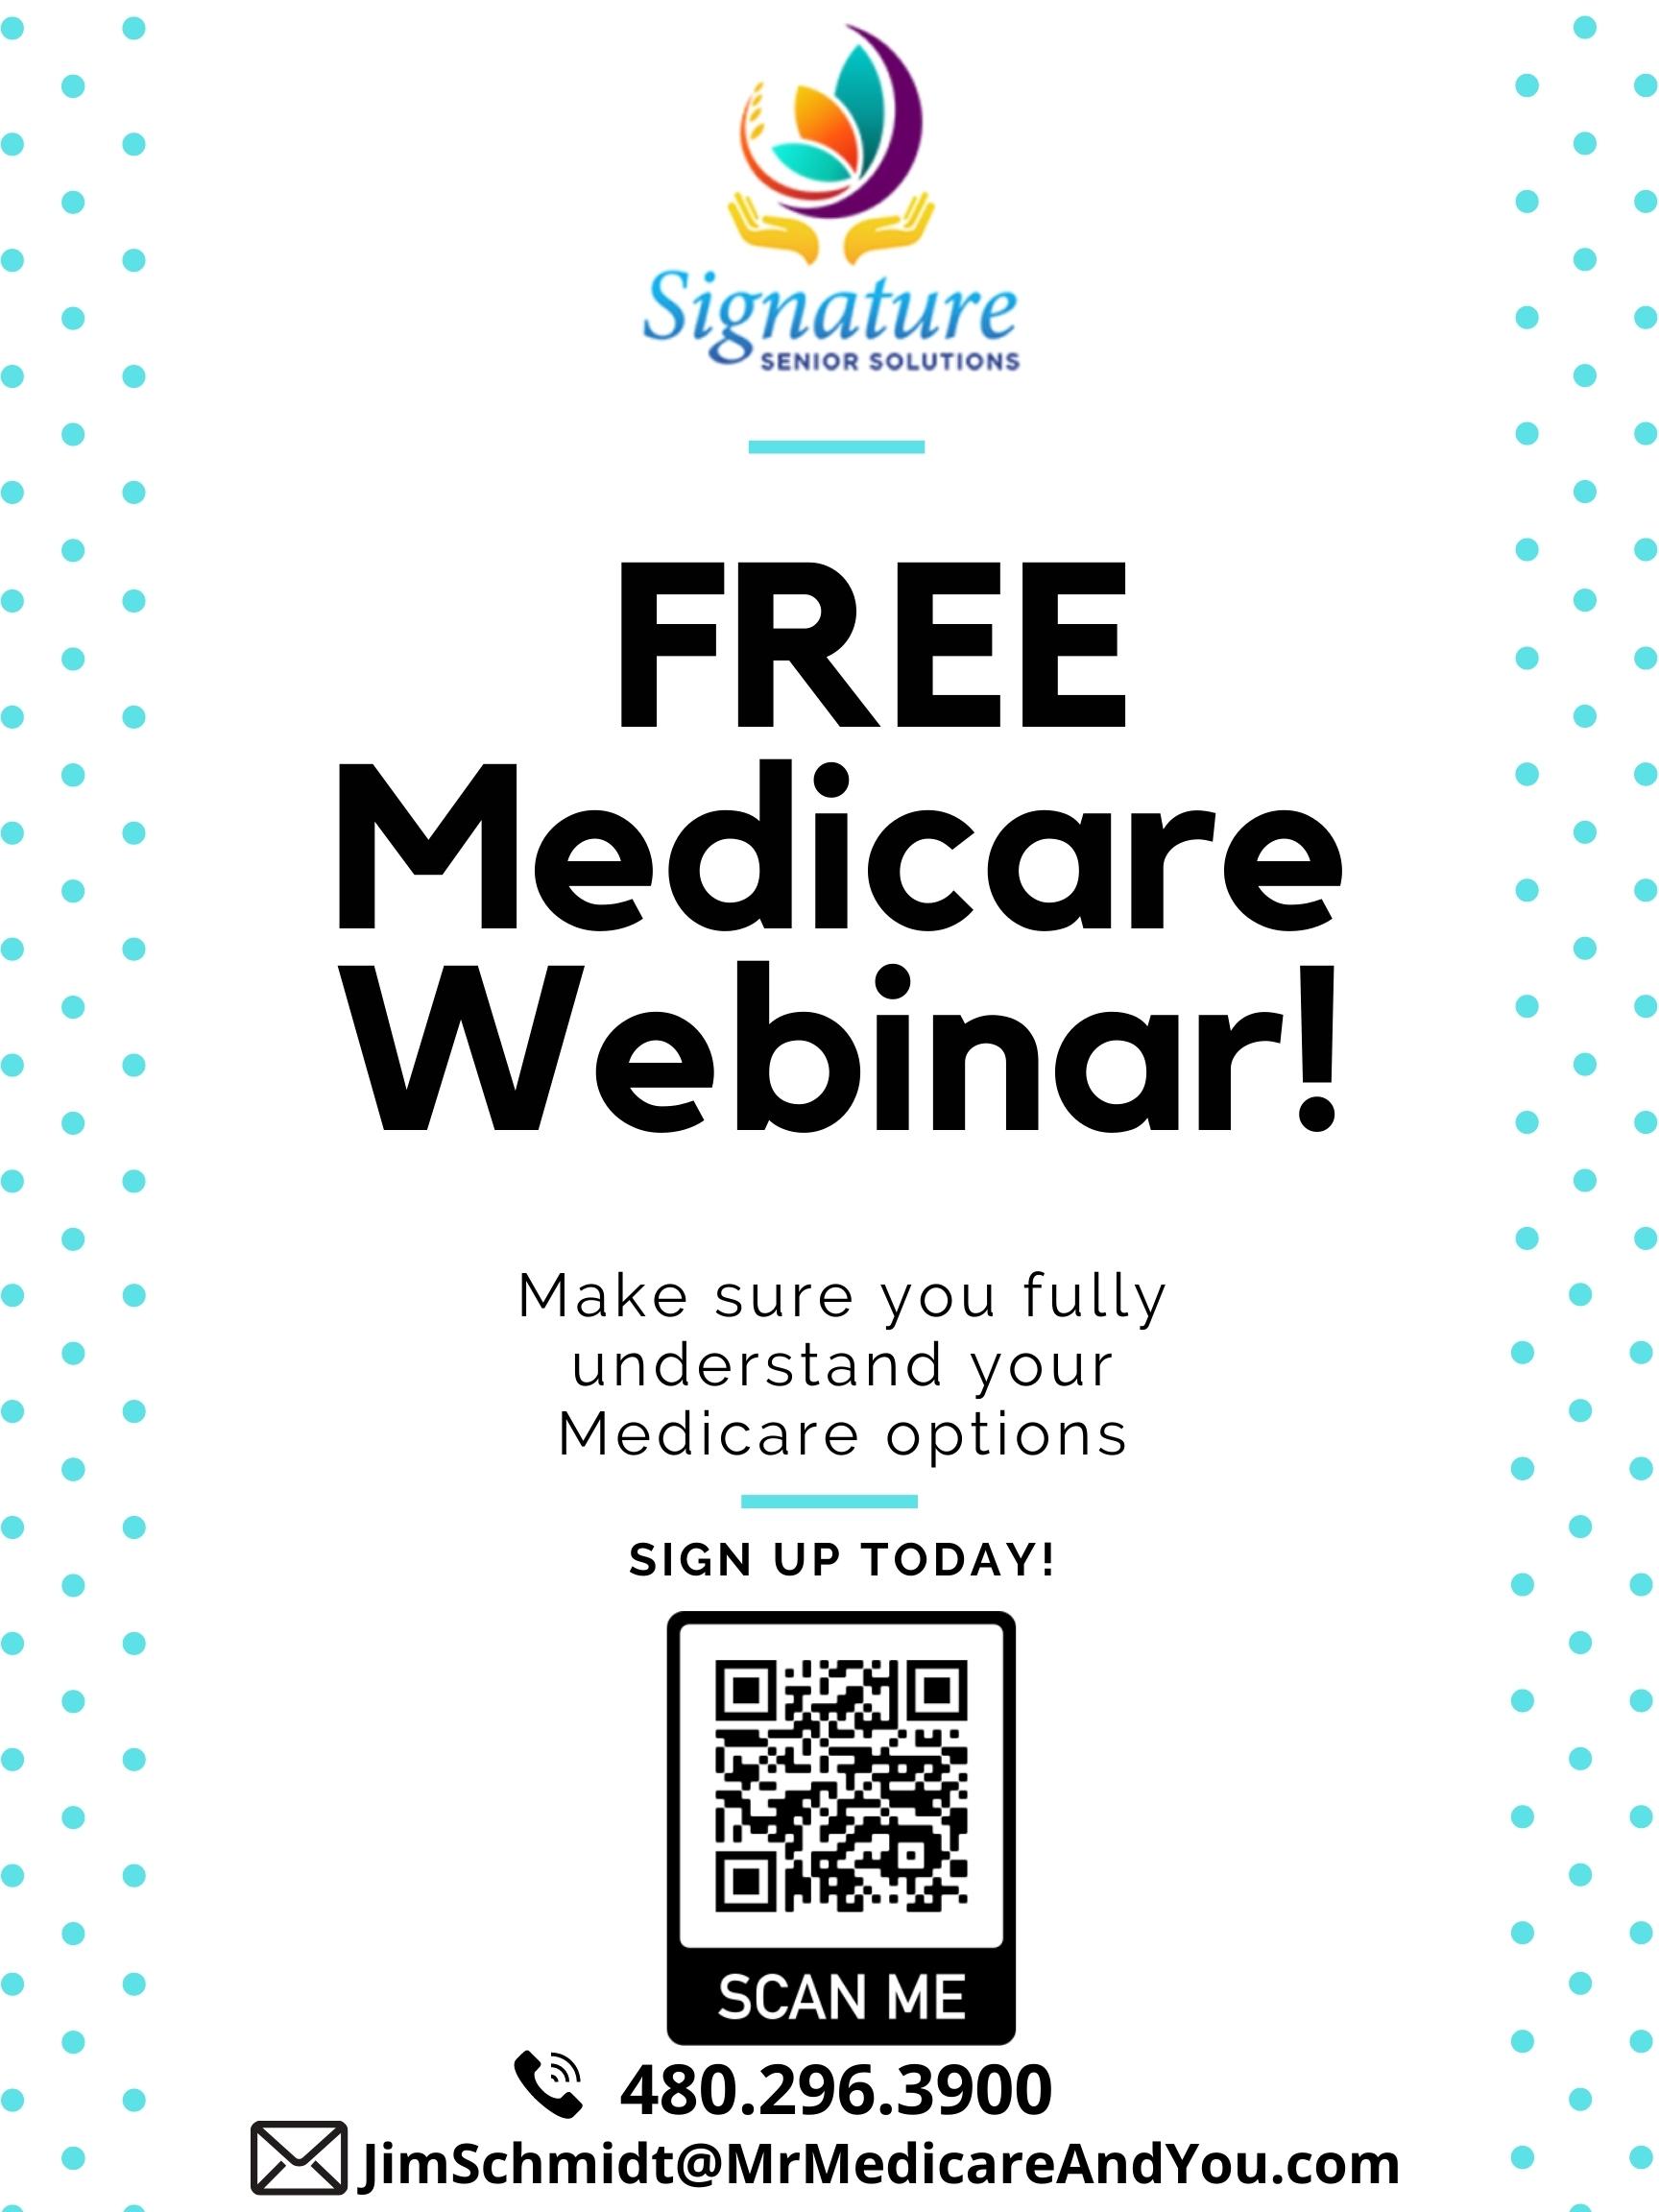 Medicare Webinar Poster